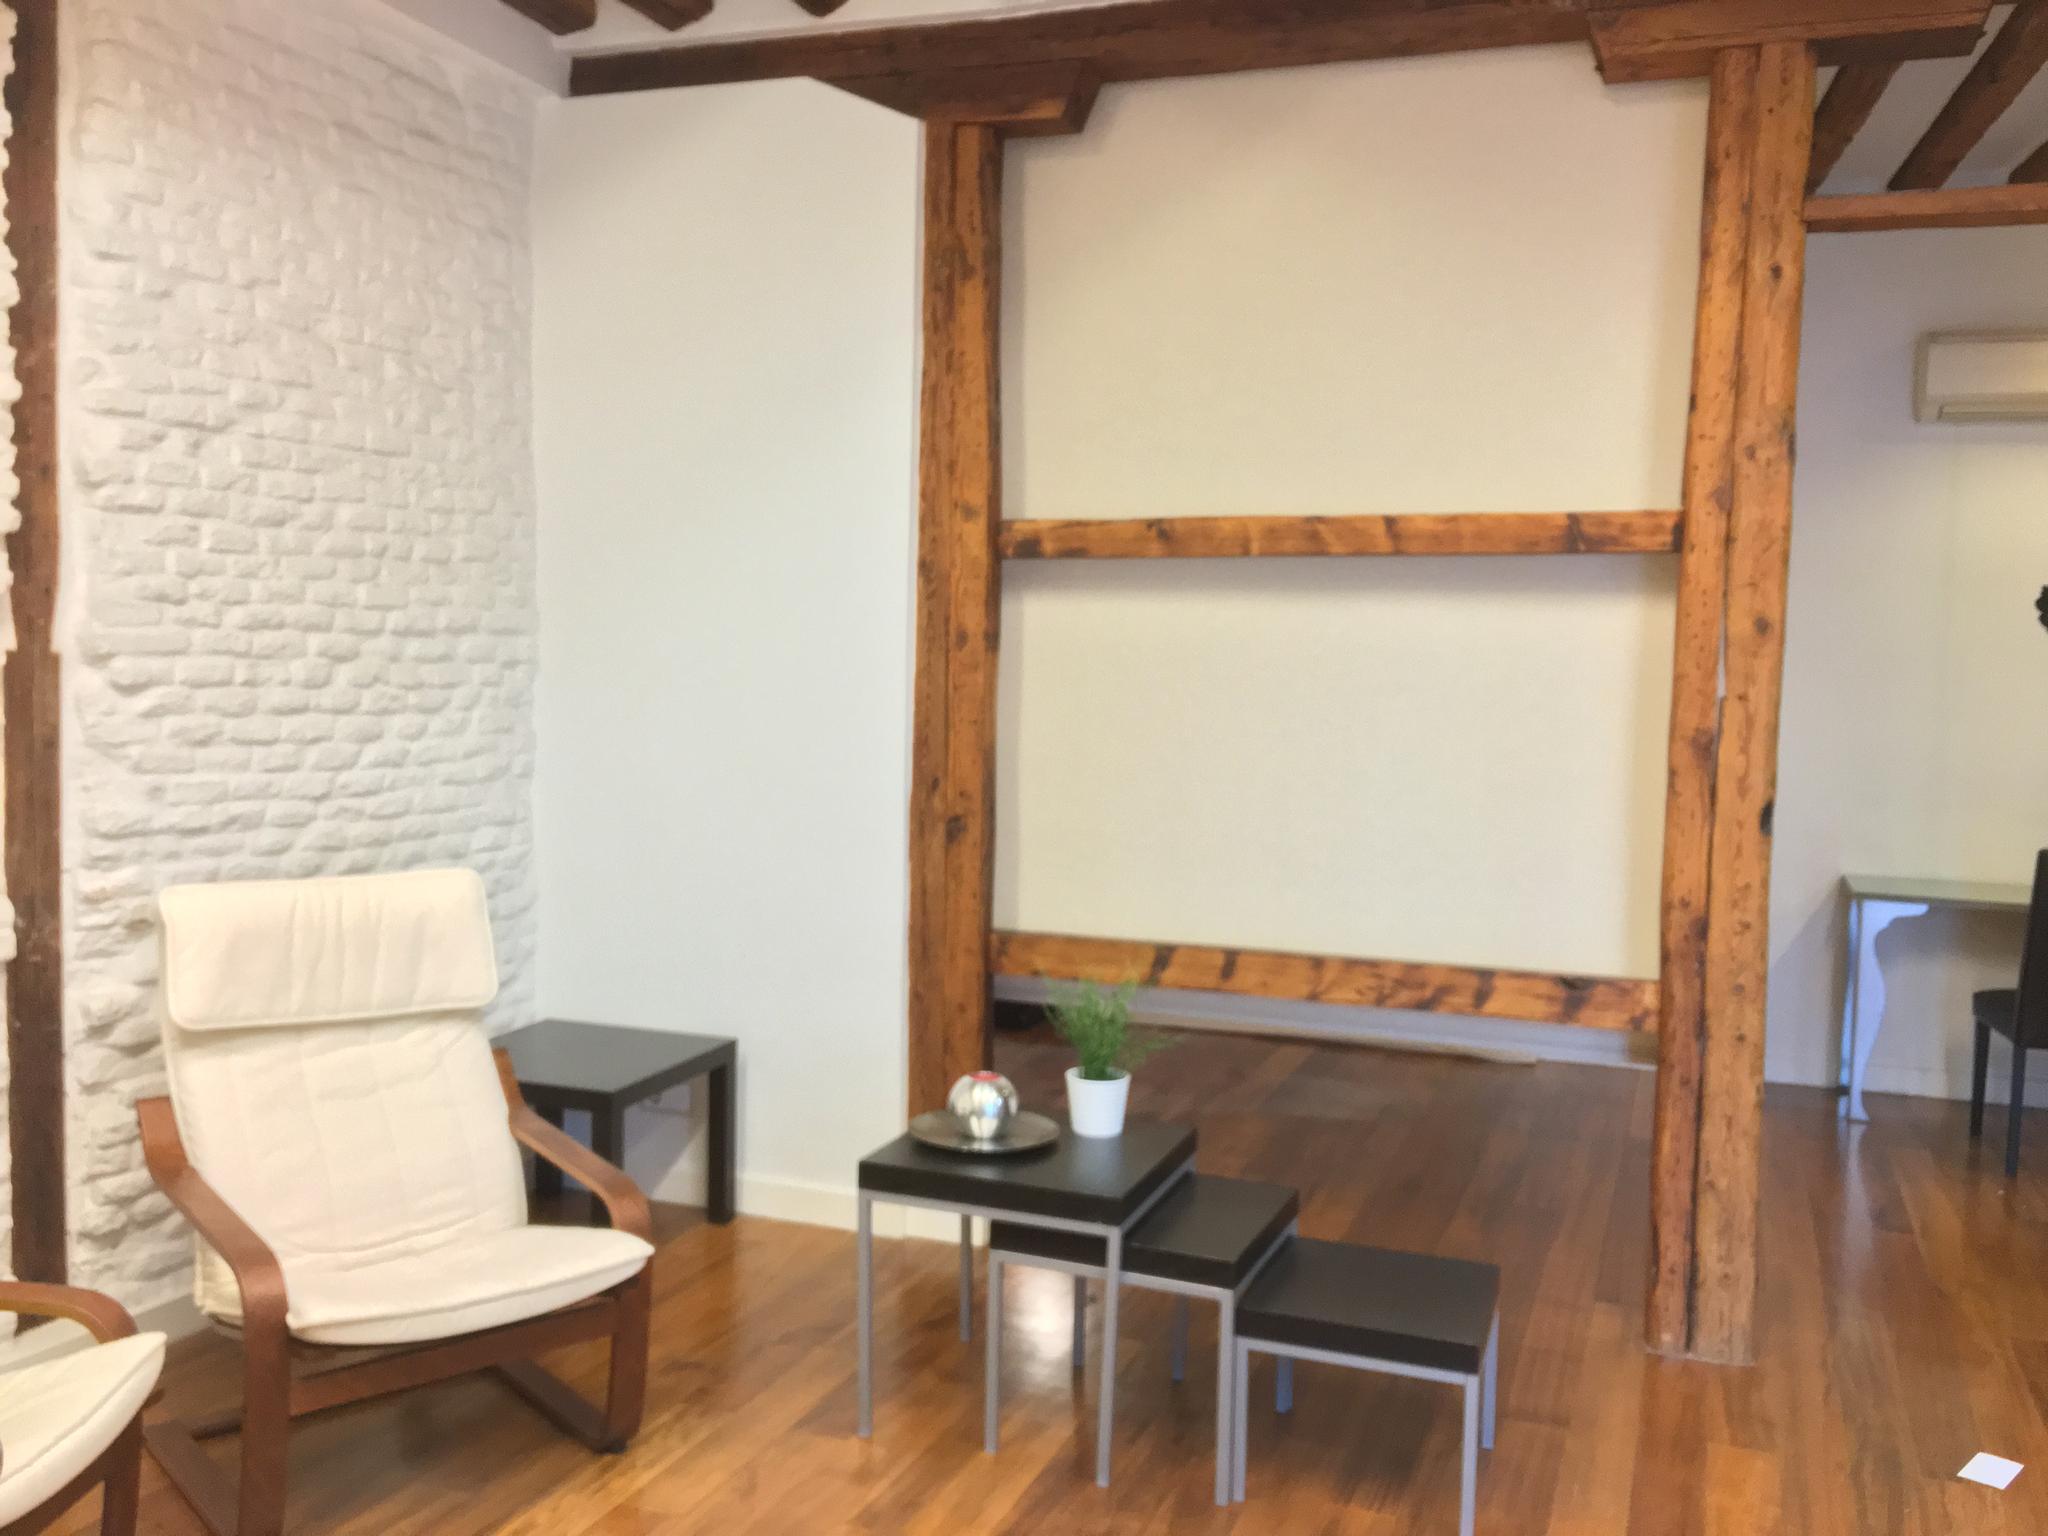 Las Huertas - Estudio de lujo en Madrid